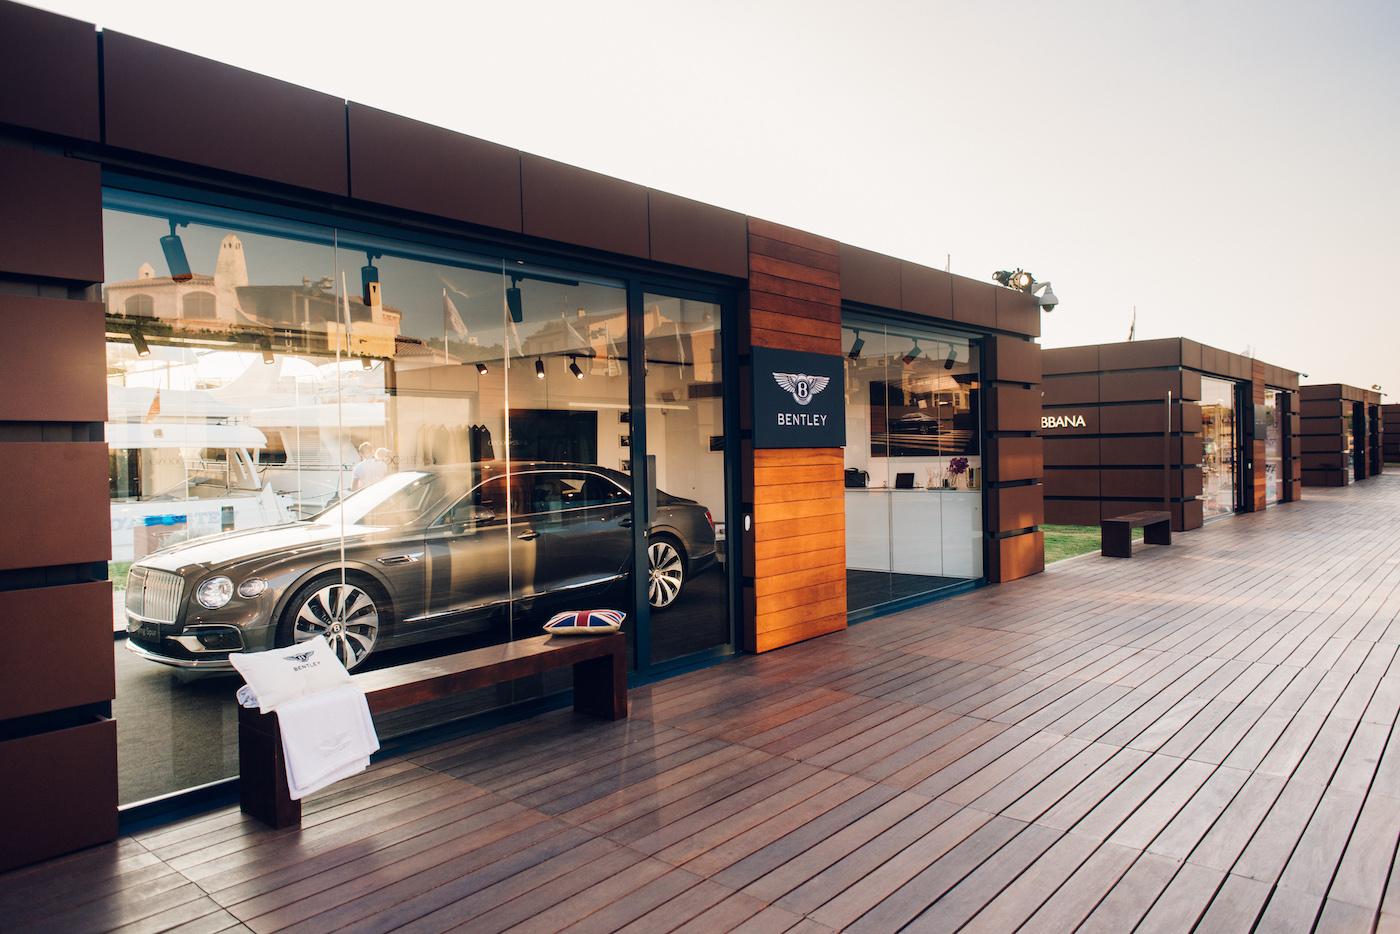 Mit Bentley in Porto Cervo: Die Bentley Summer Tour 2019 9